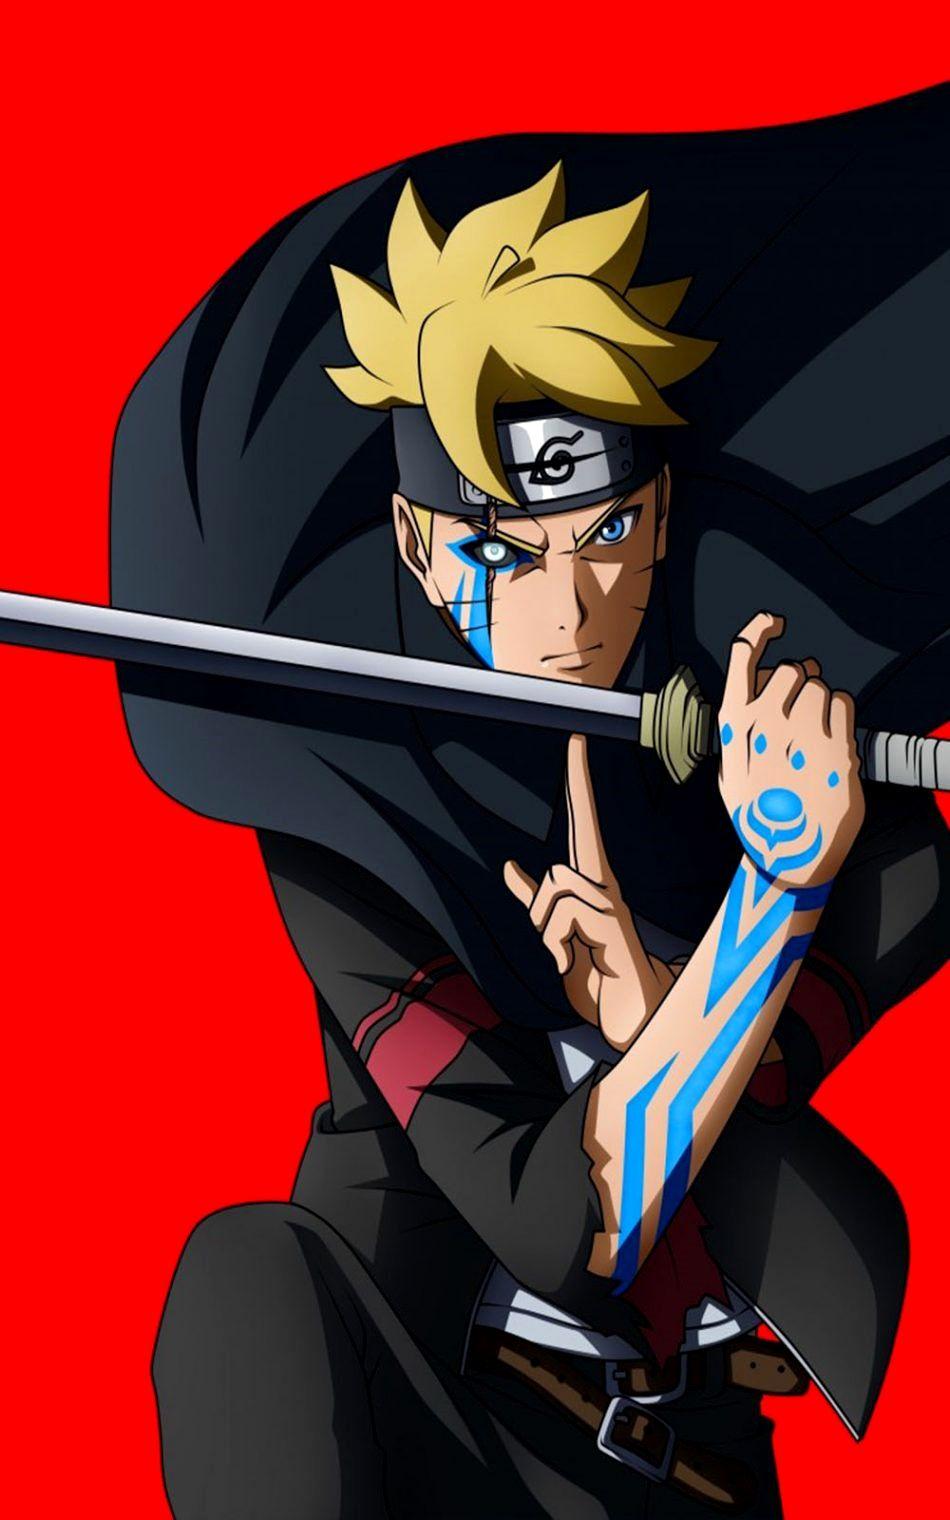 Wallpaper 4K Ultra Hd Naruto Gallery Anime, Wallpapers